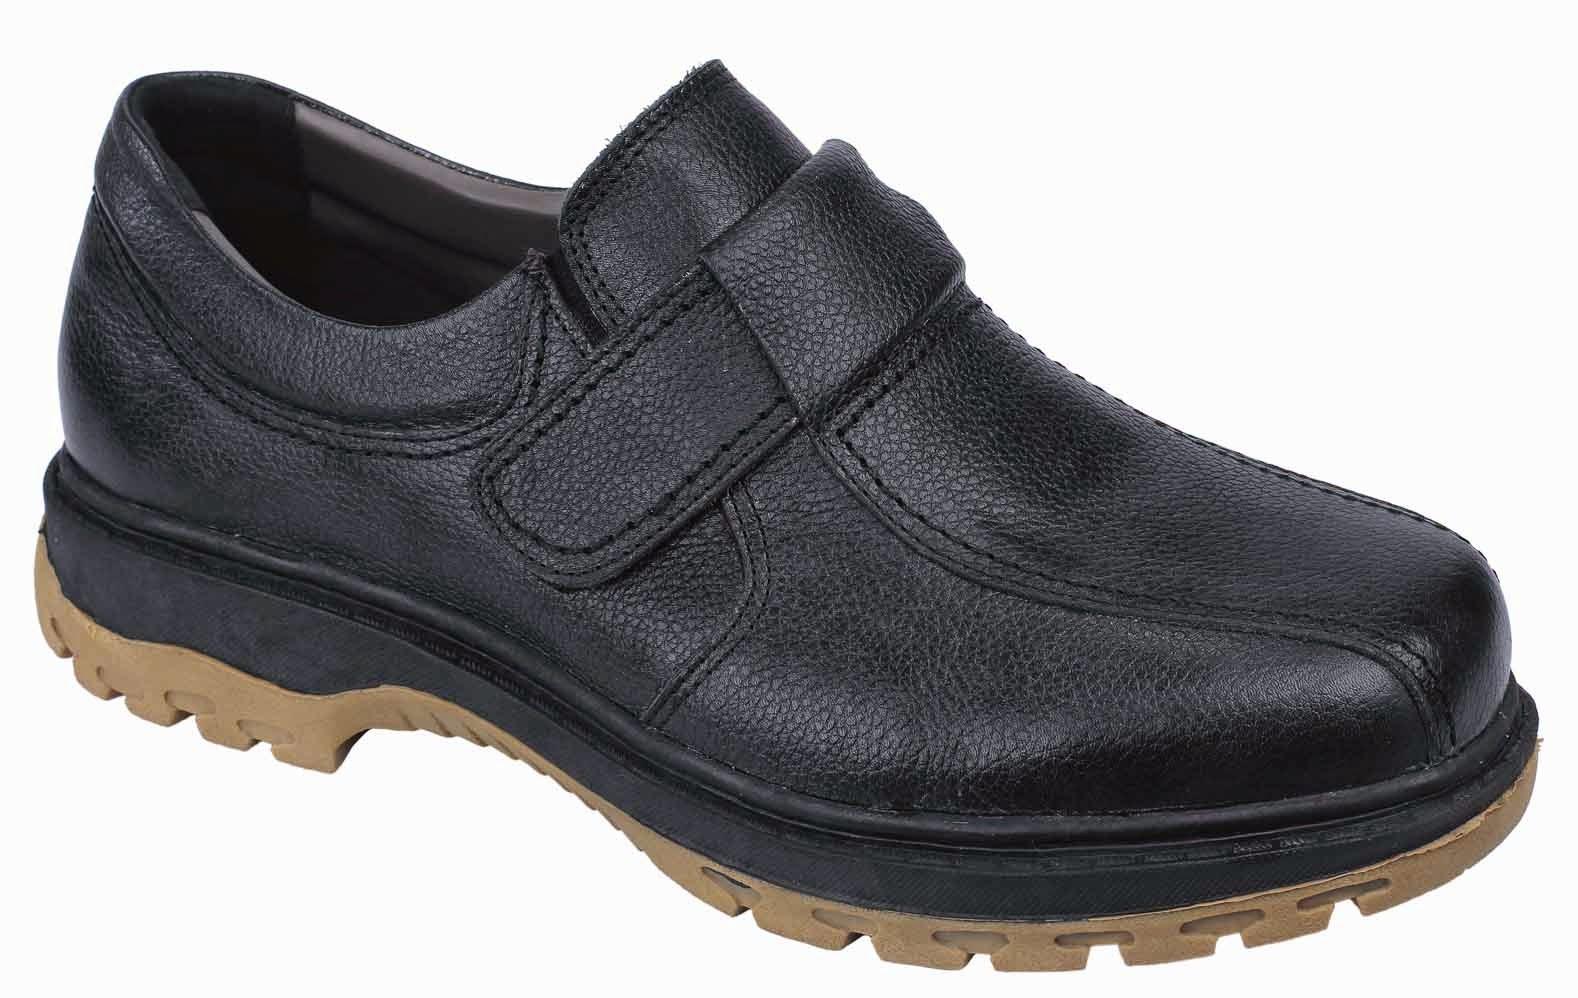 Sepatu safety cibaduyut online, toko online sepatu safety, sepatu safety kulit asli, sepatu safety terbaru, sepatu safety trendy